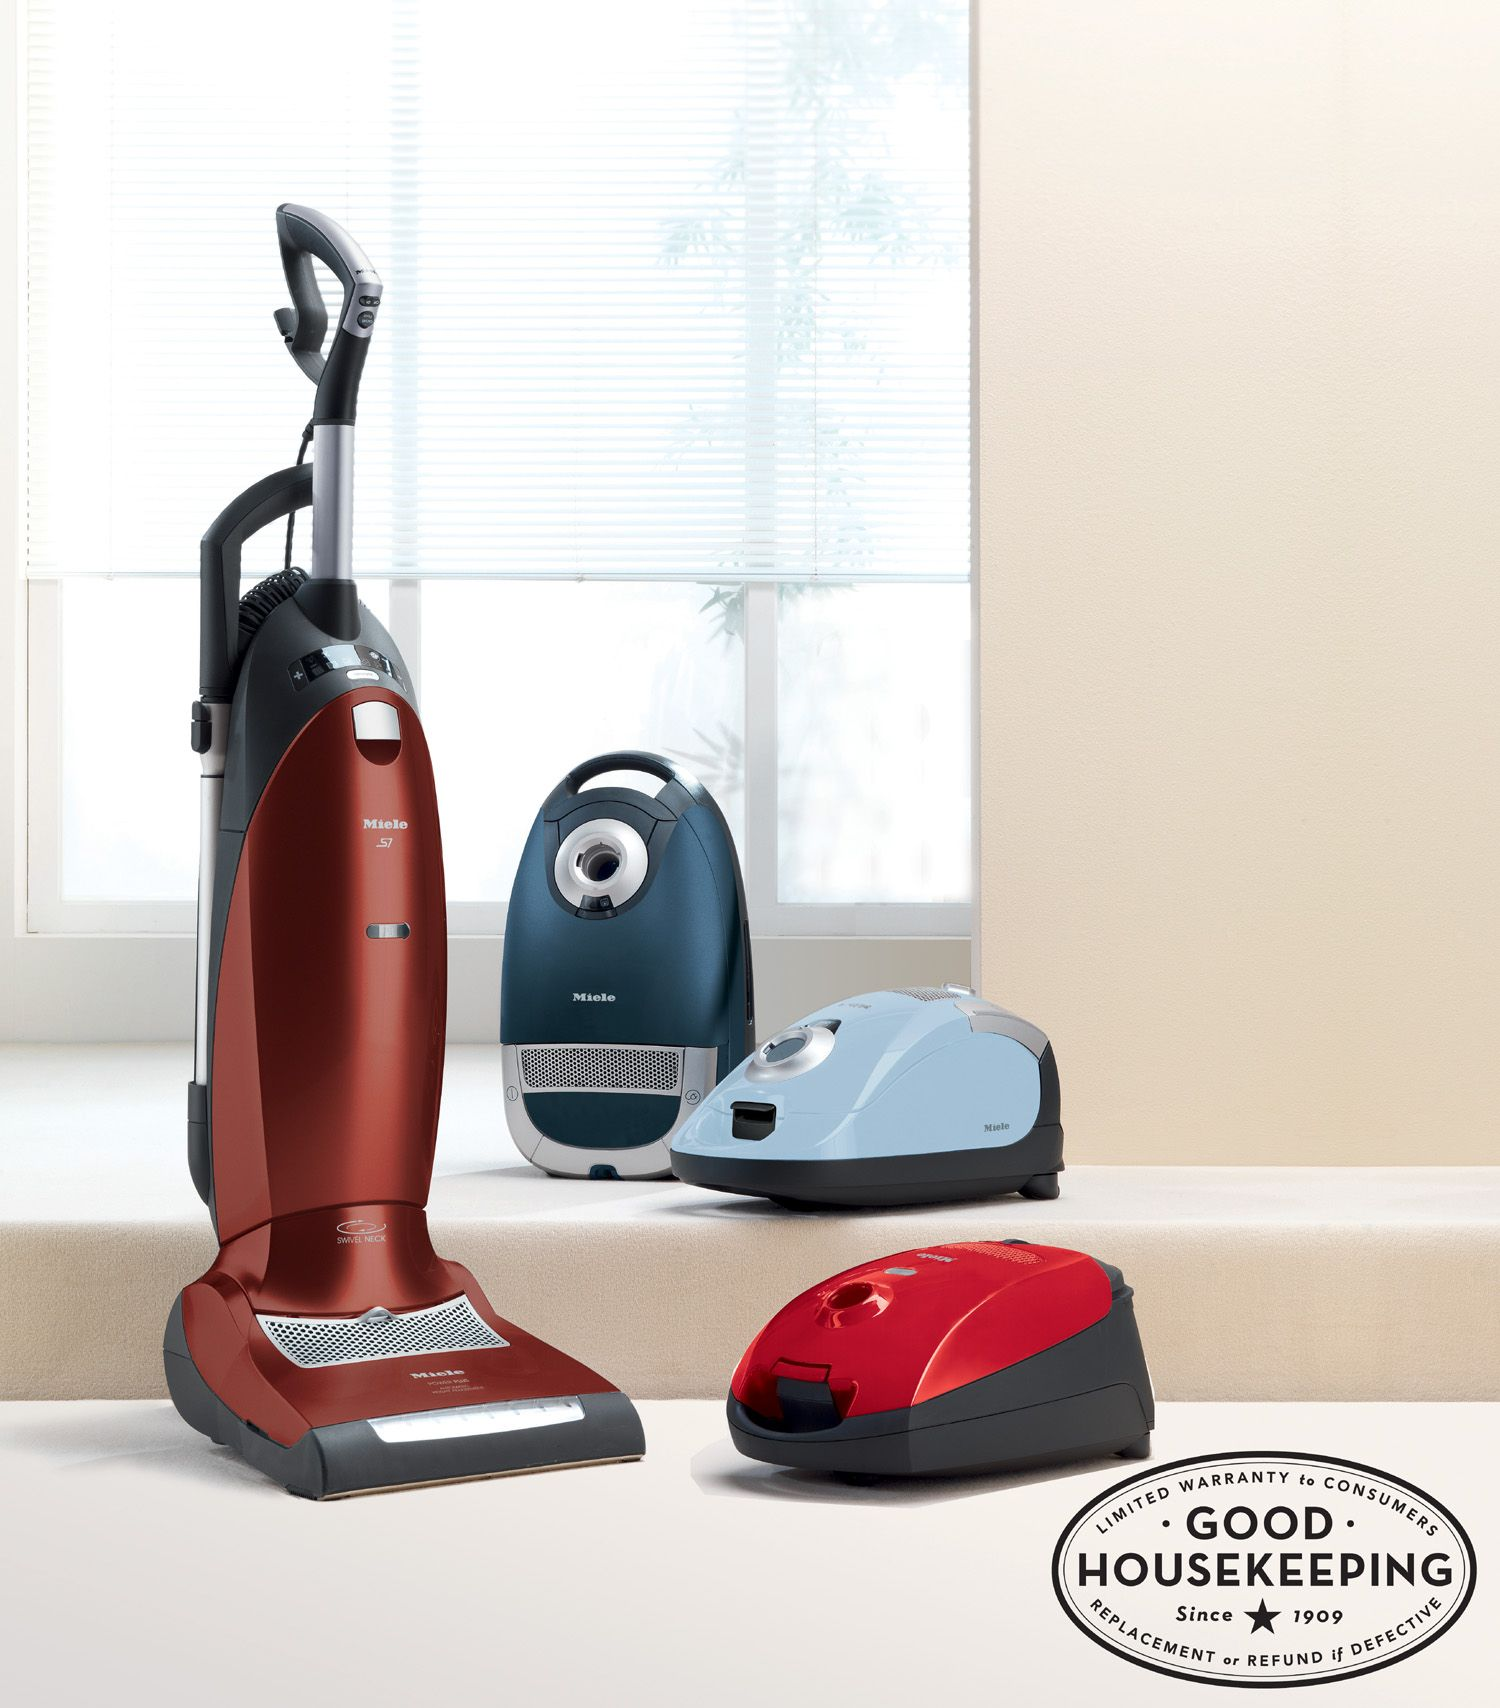 Miele Vacuum Cleaners Earn The Good Housekeeping Seal